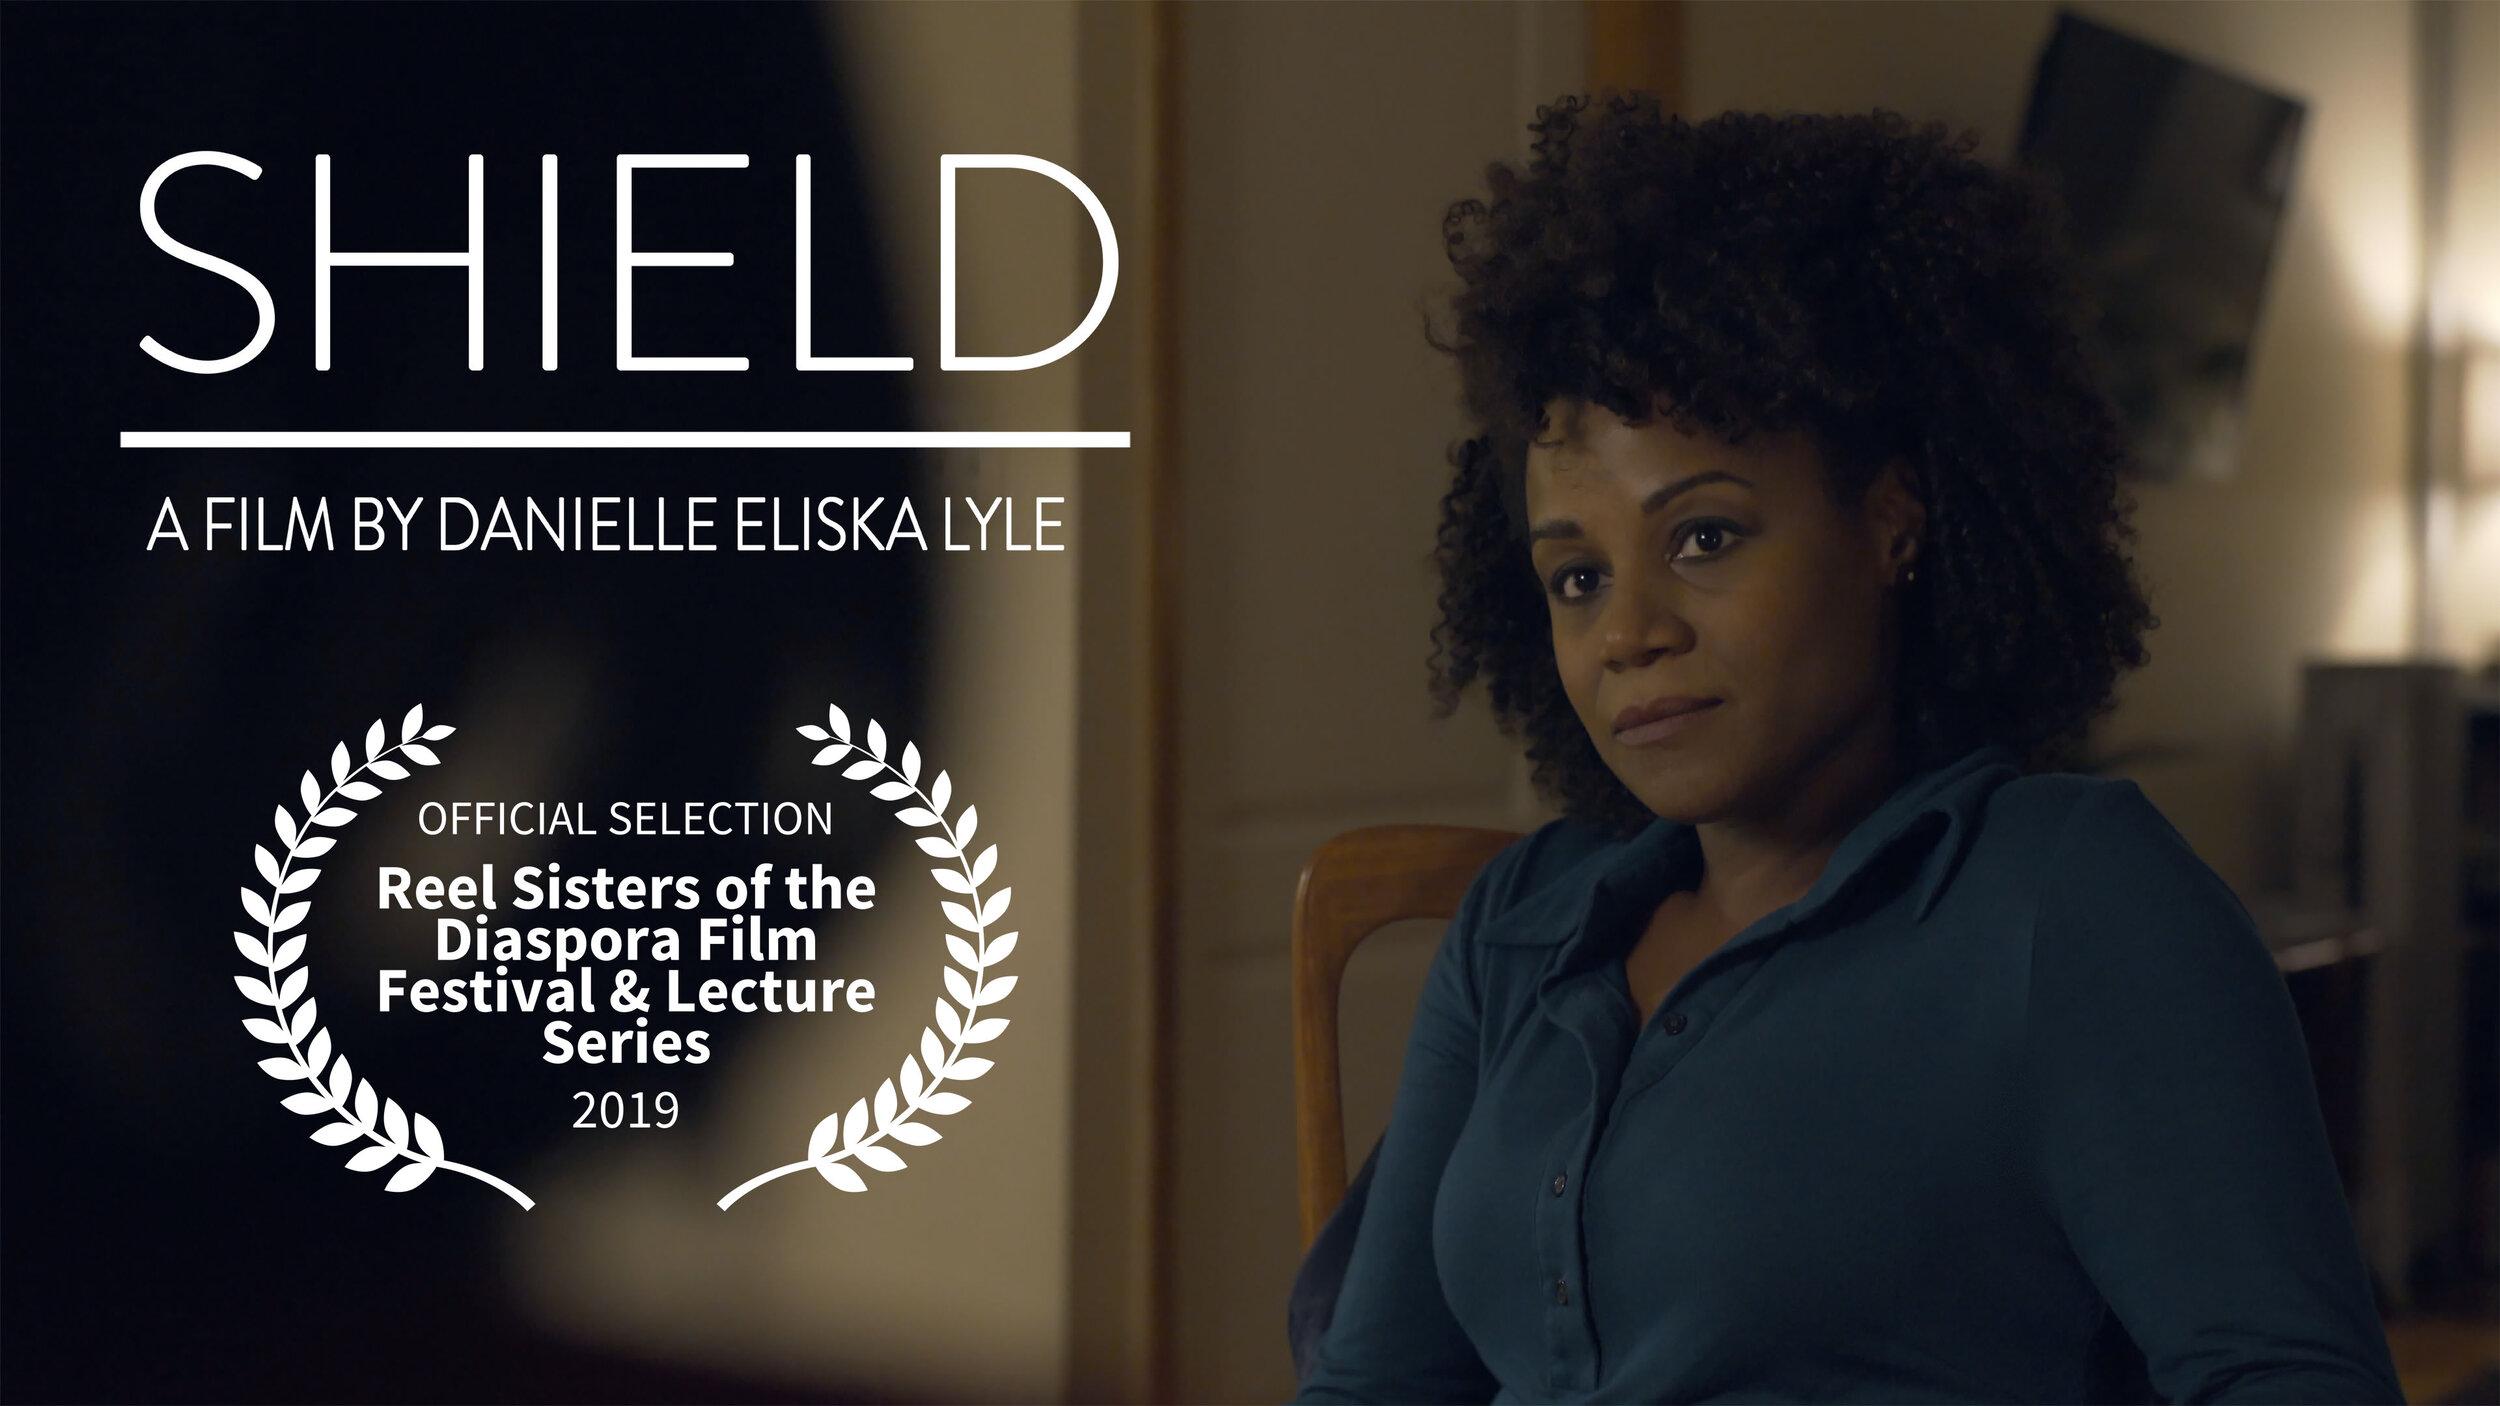 Sat 10/5 at 2:40pm - Reel Sisters of the Diaspora Film FestivalHarlem, New York